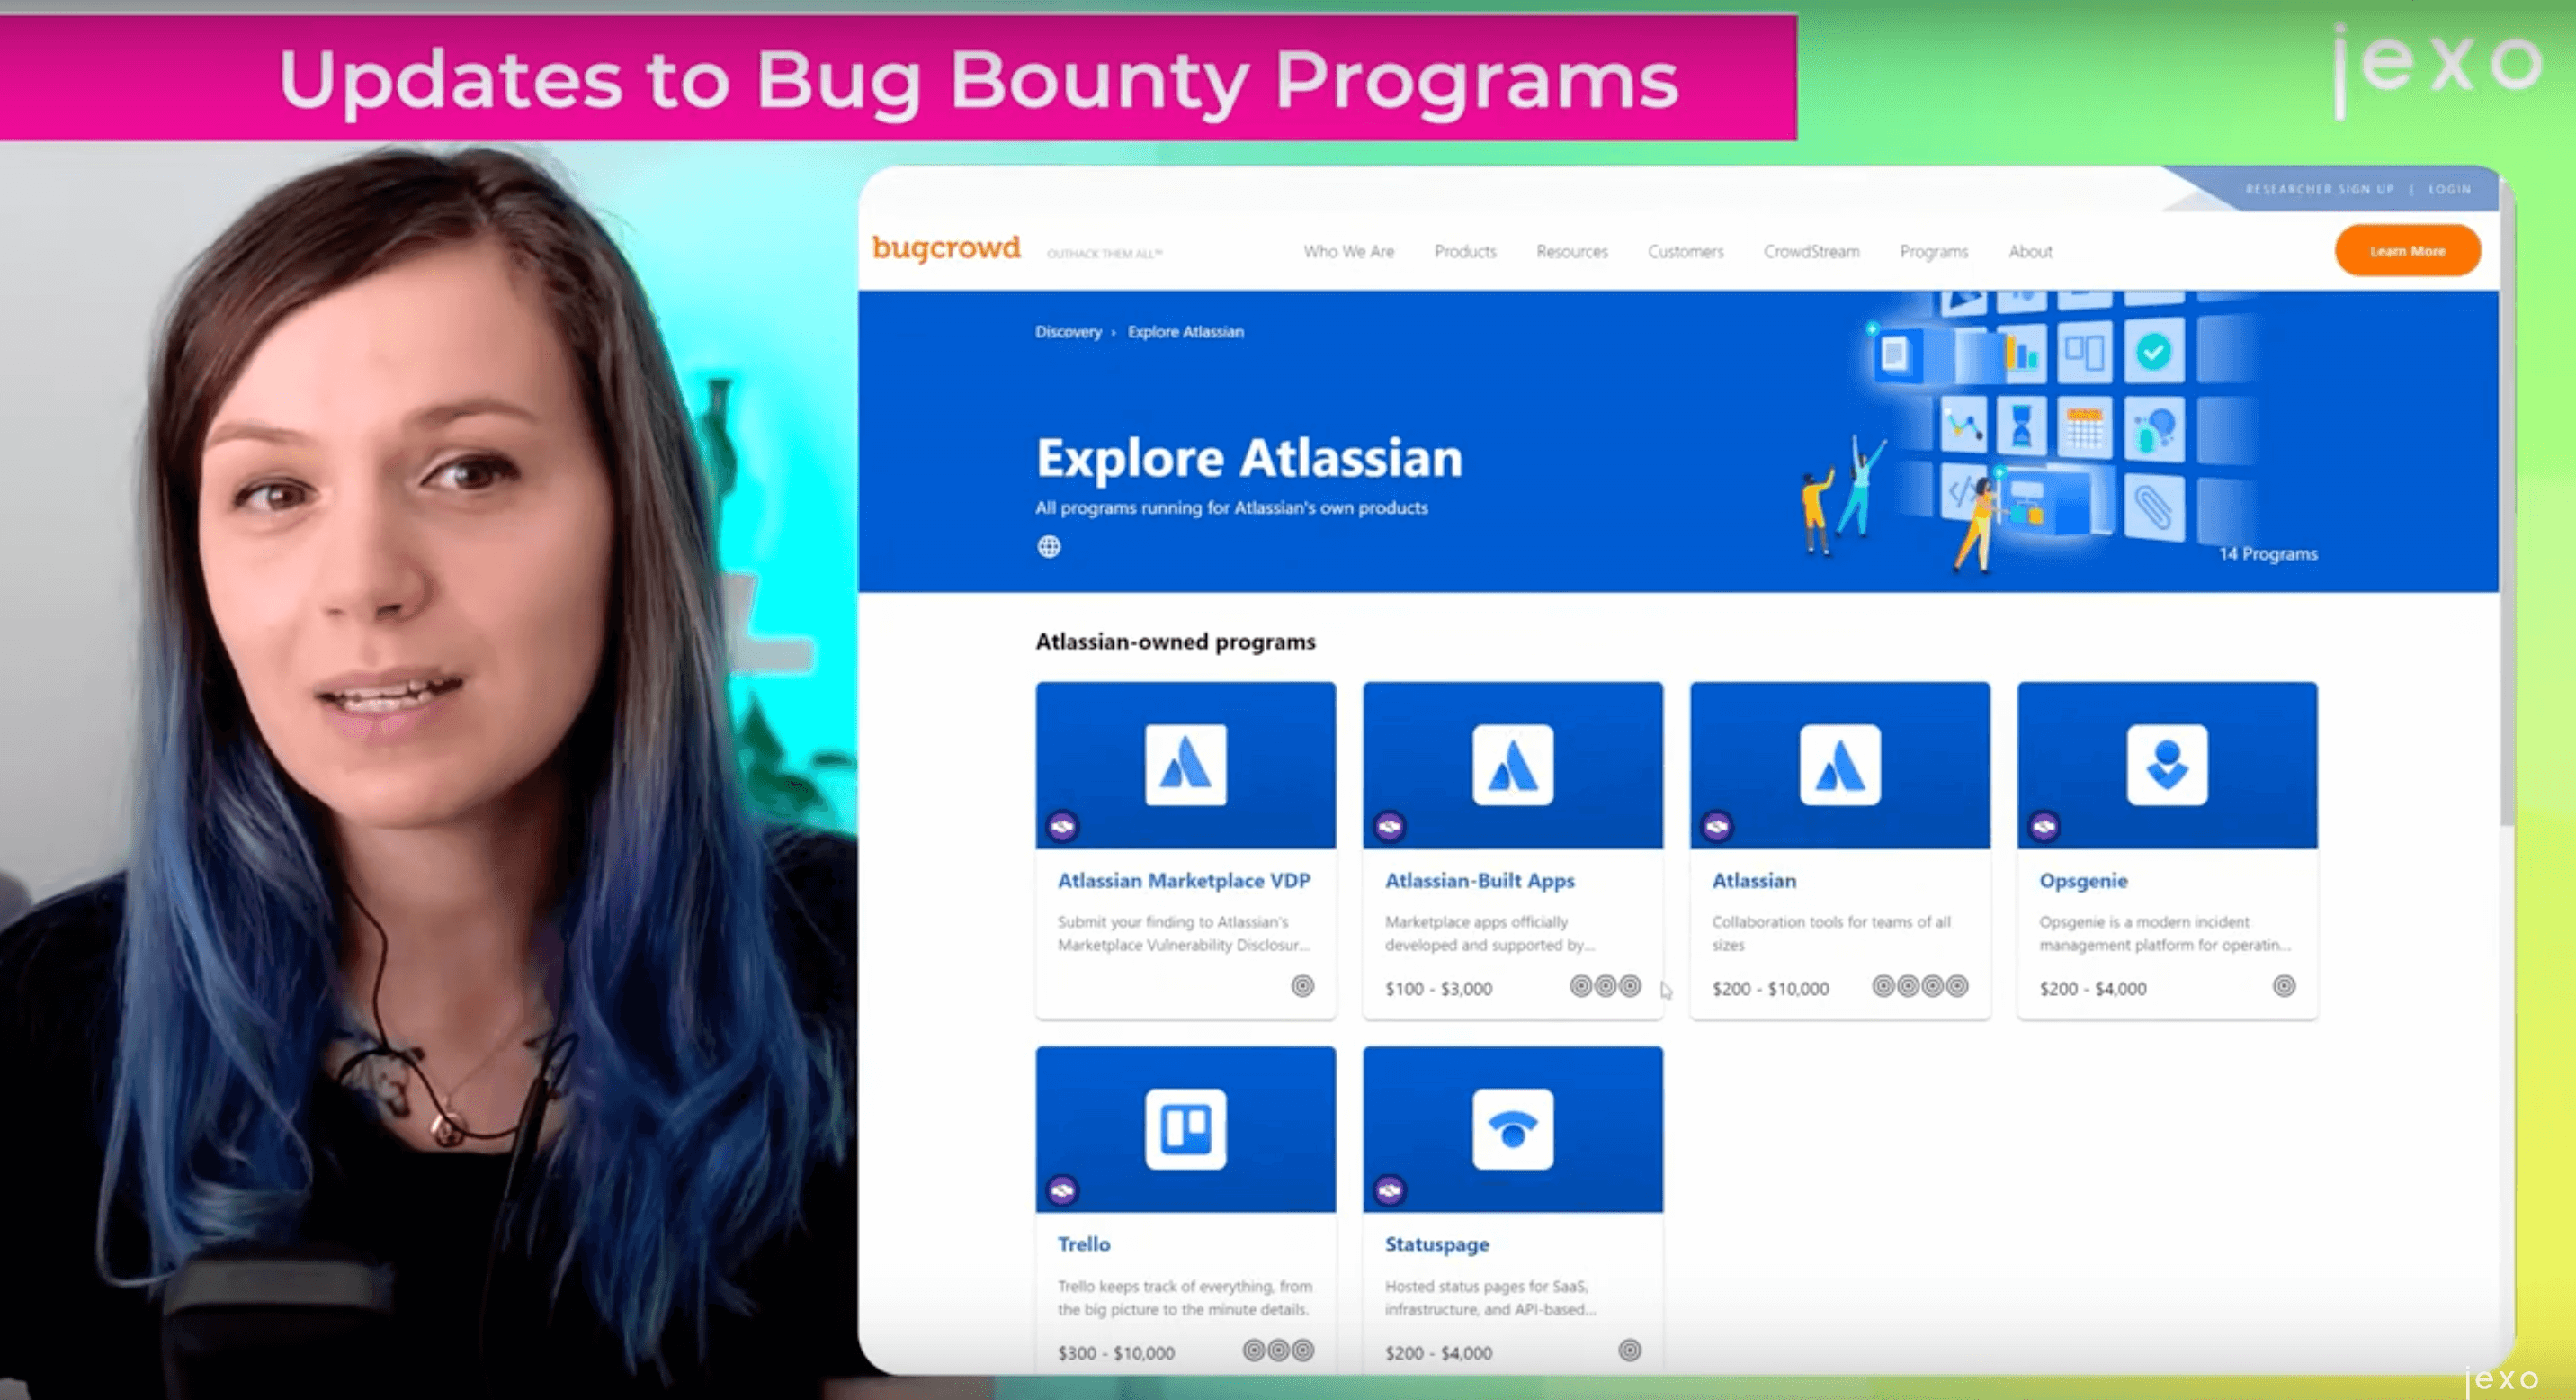 Atlassian News: Updates to Atlassian bug bounty program